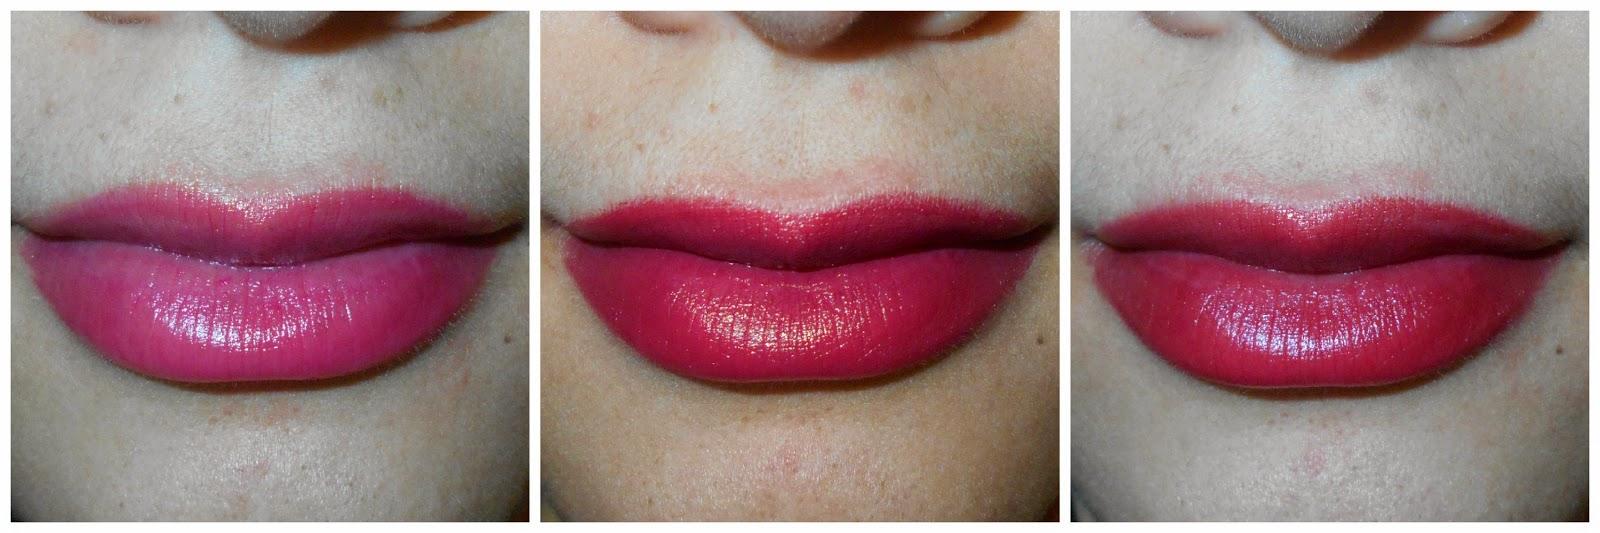 E.L.F Studio Matte Lip Colors! (New Shades!)